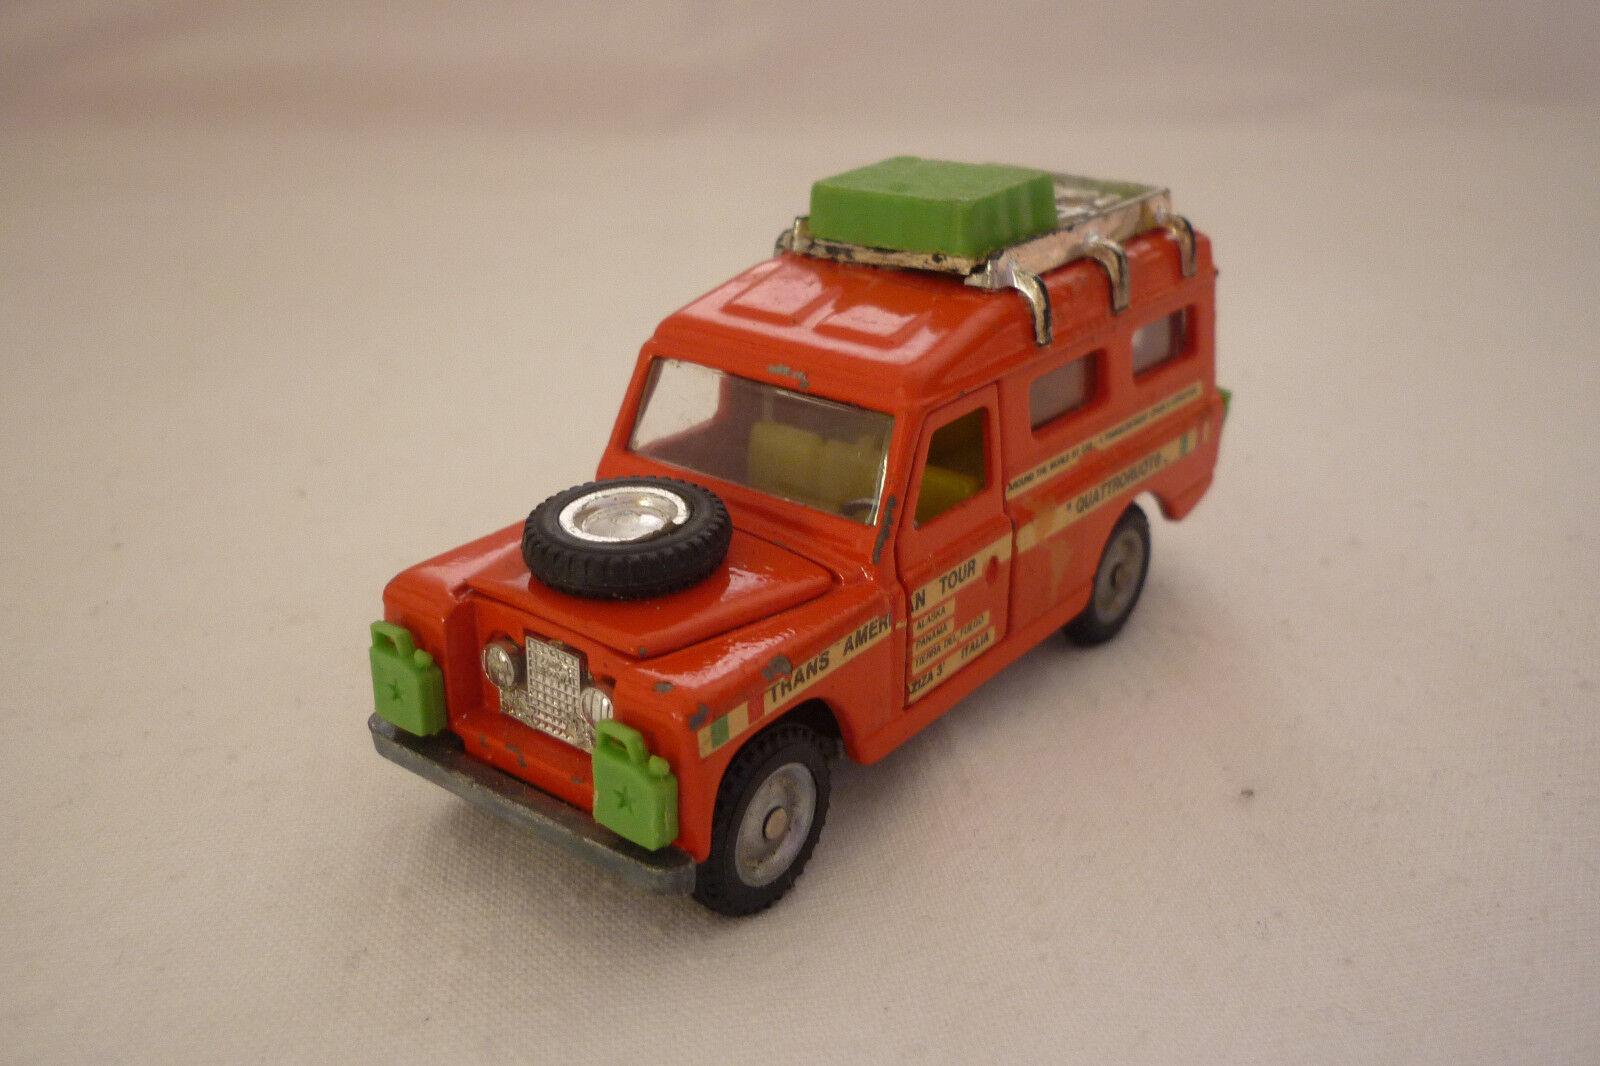 MEBETOYS-Vintage Metal Model-Land Rover - 1 43 - (mebet 2)